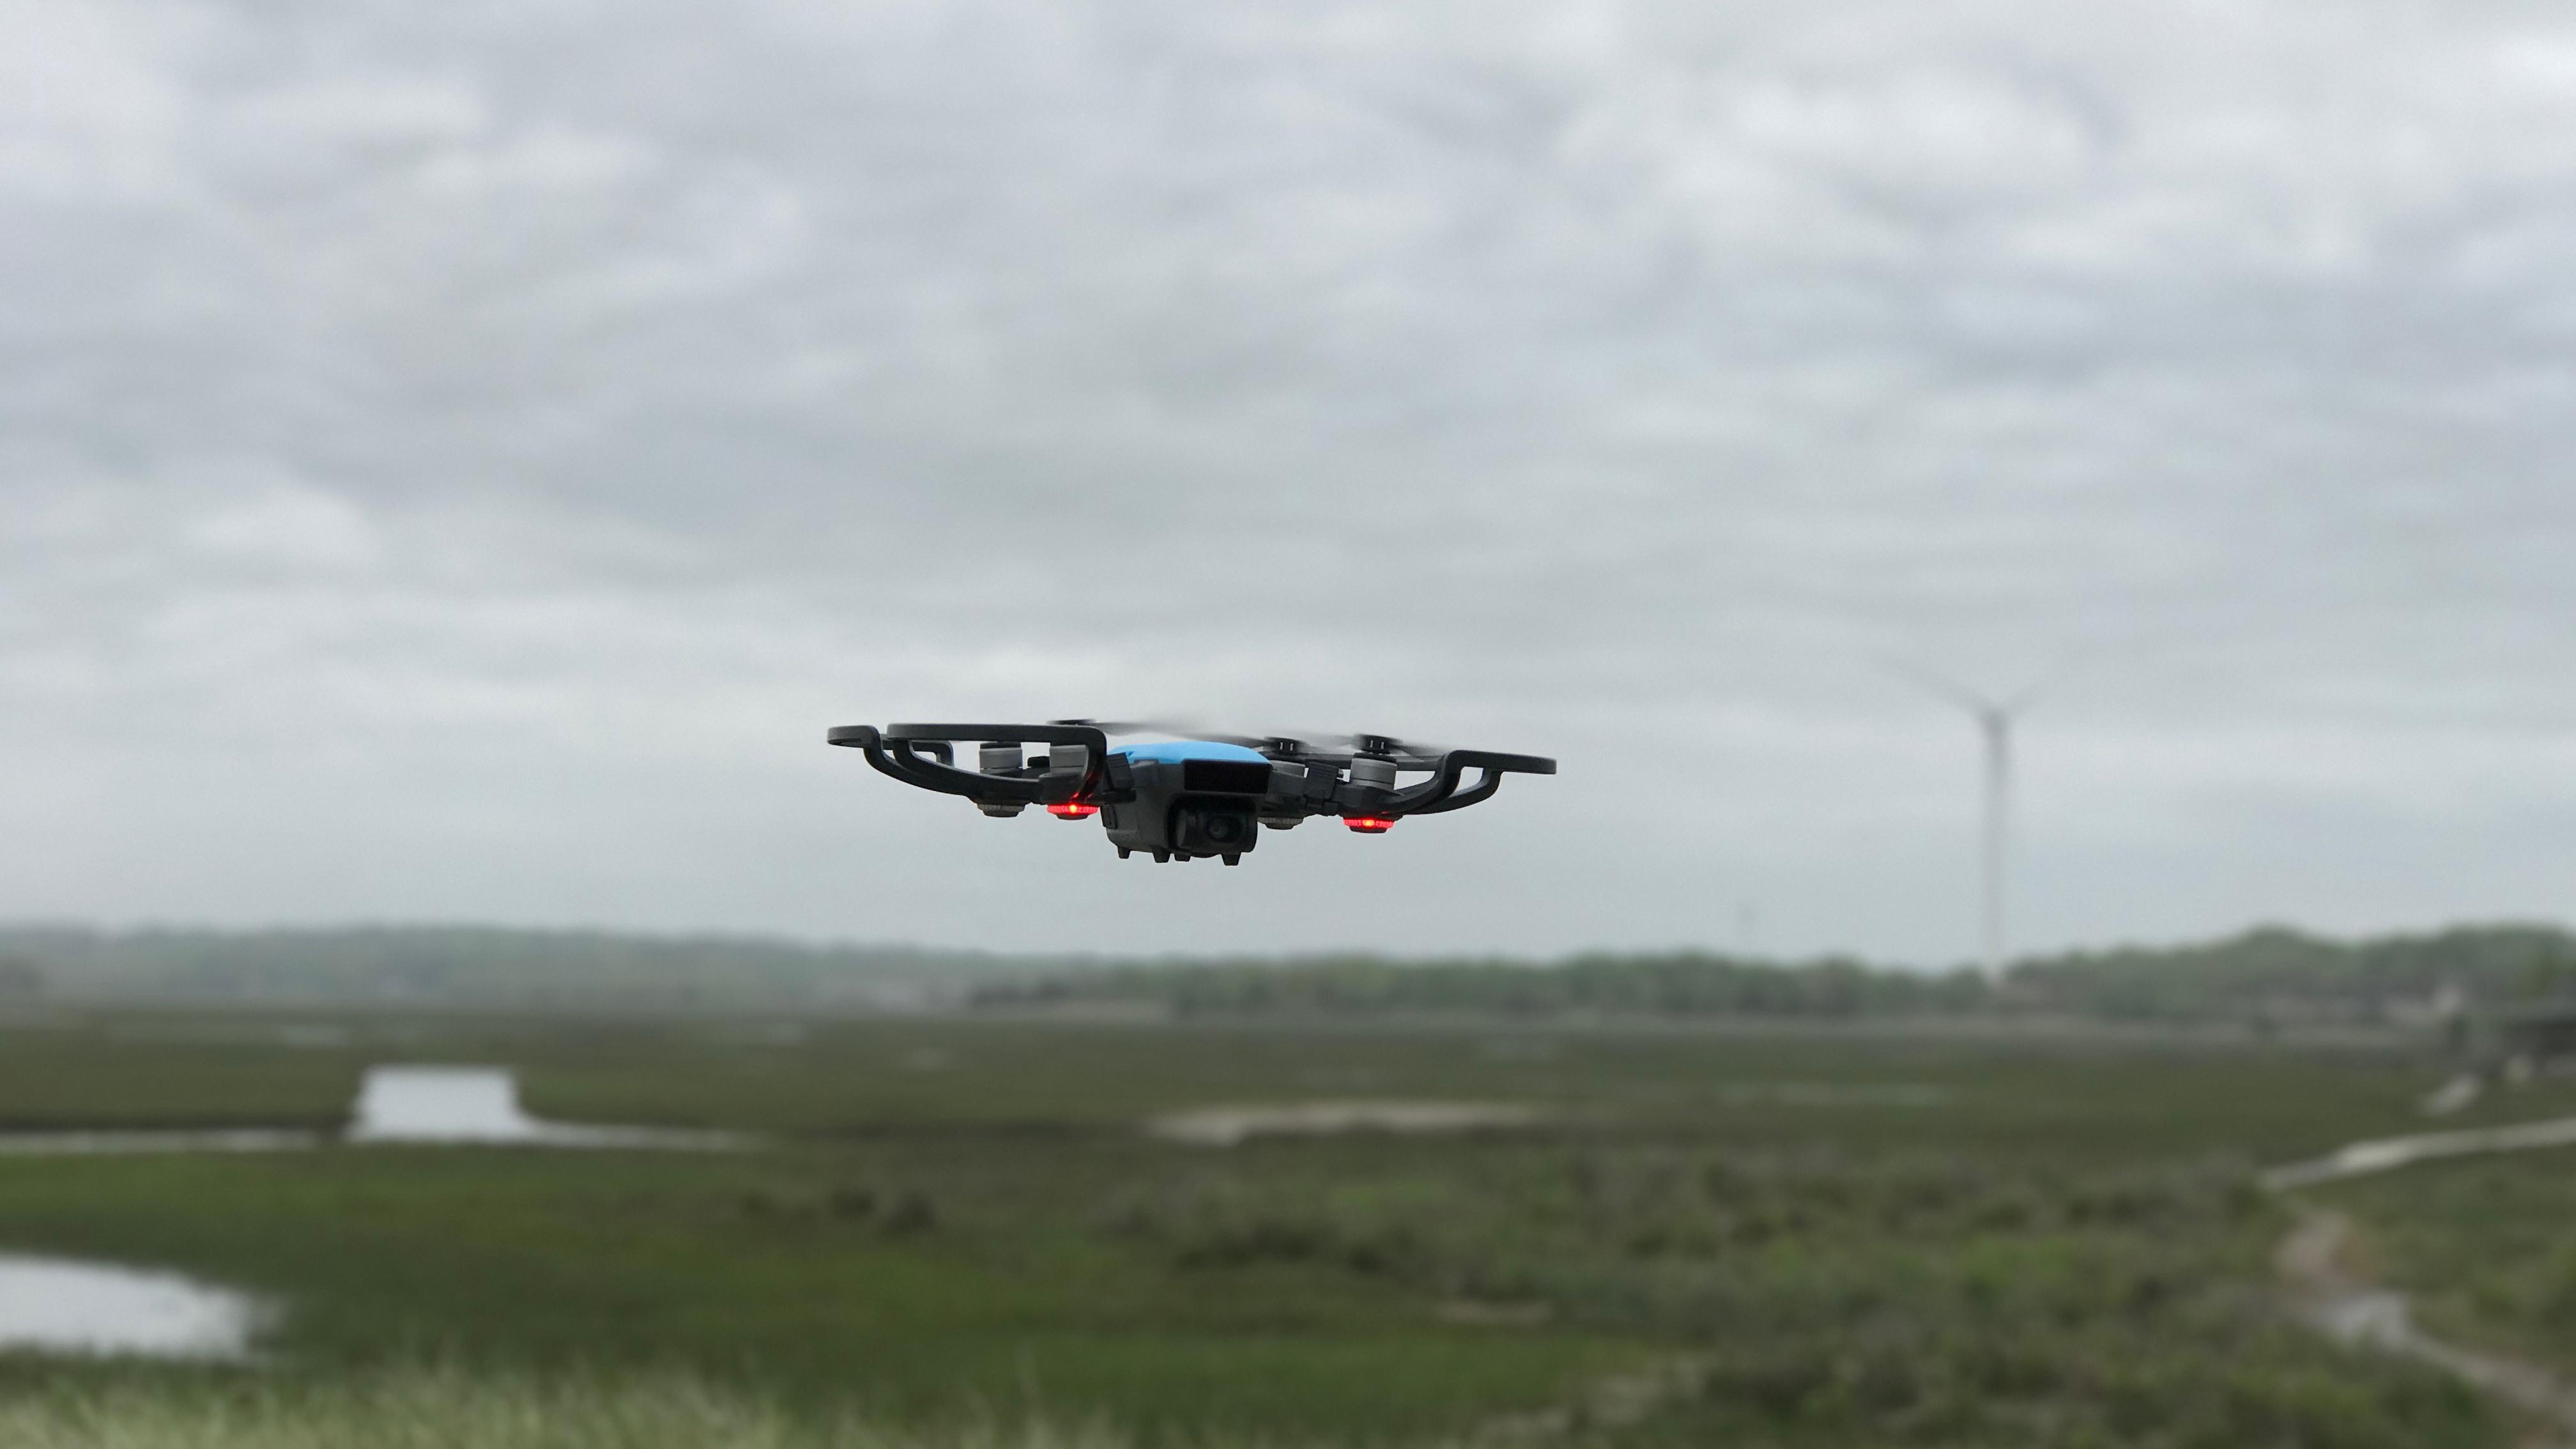 dji spark drone falling from sky